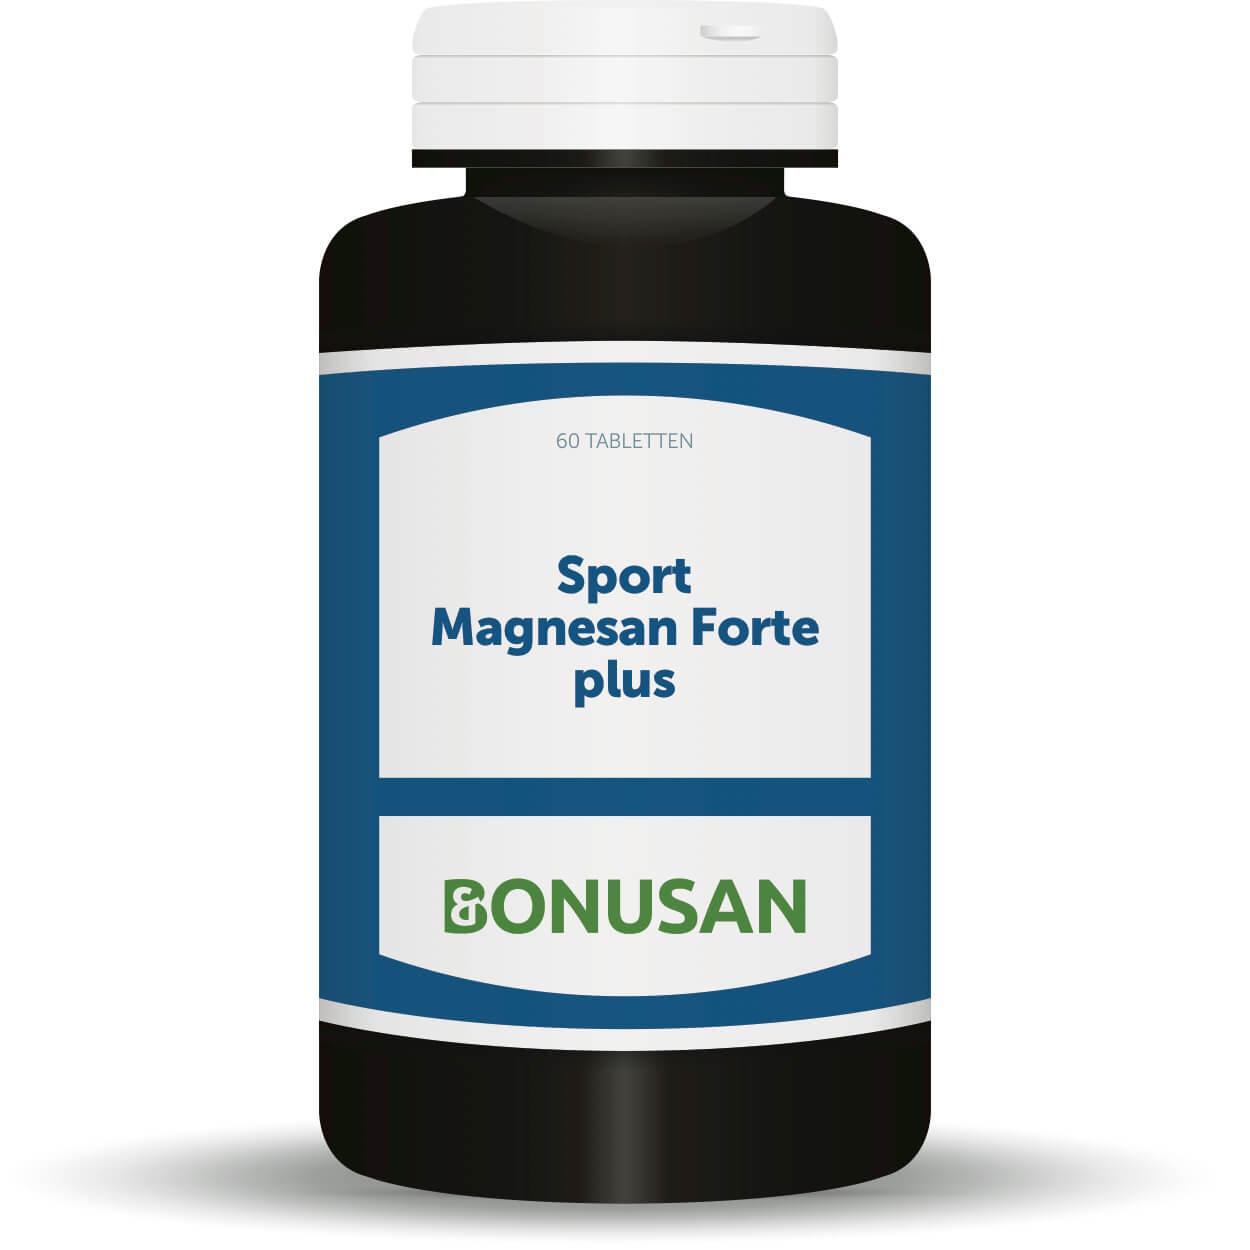 Sport Magnesan Forte plus